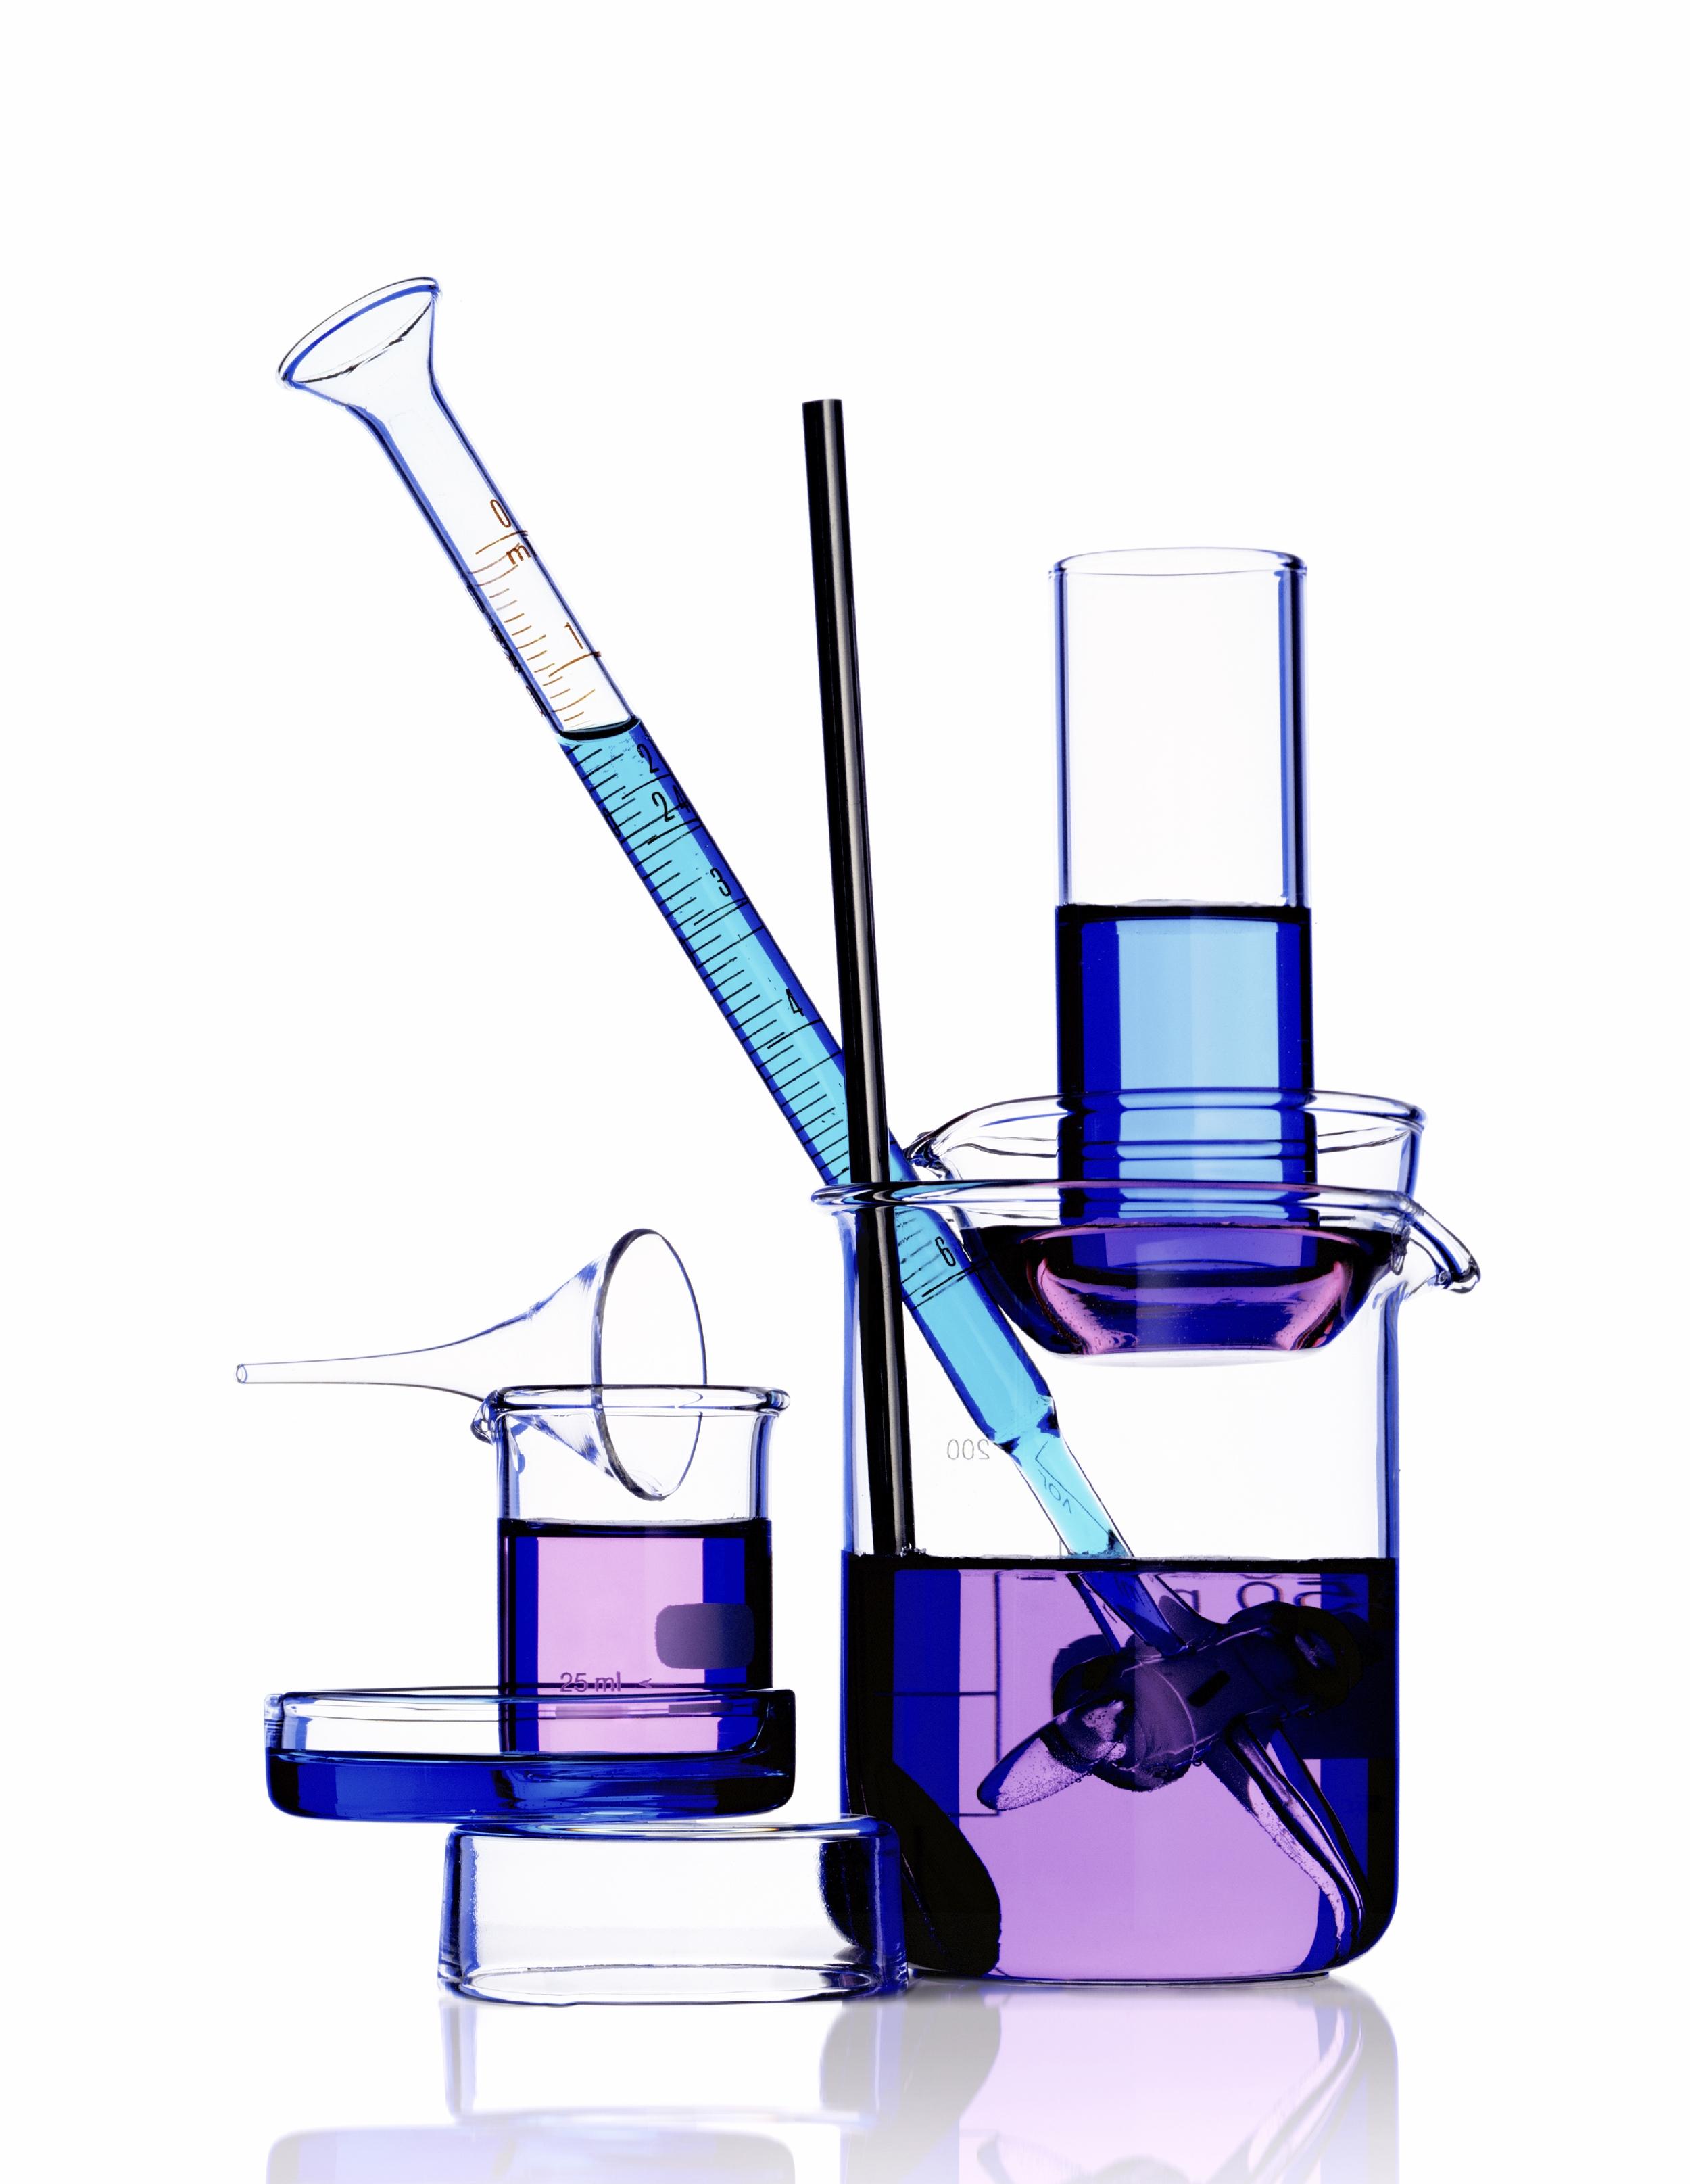 Life Sciences Sanitation Products